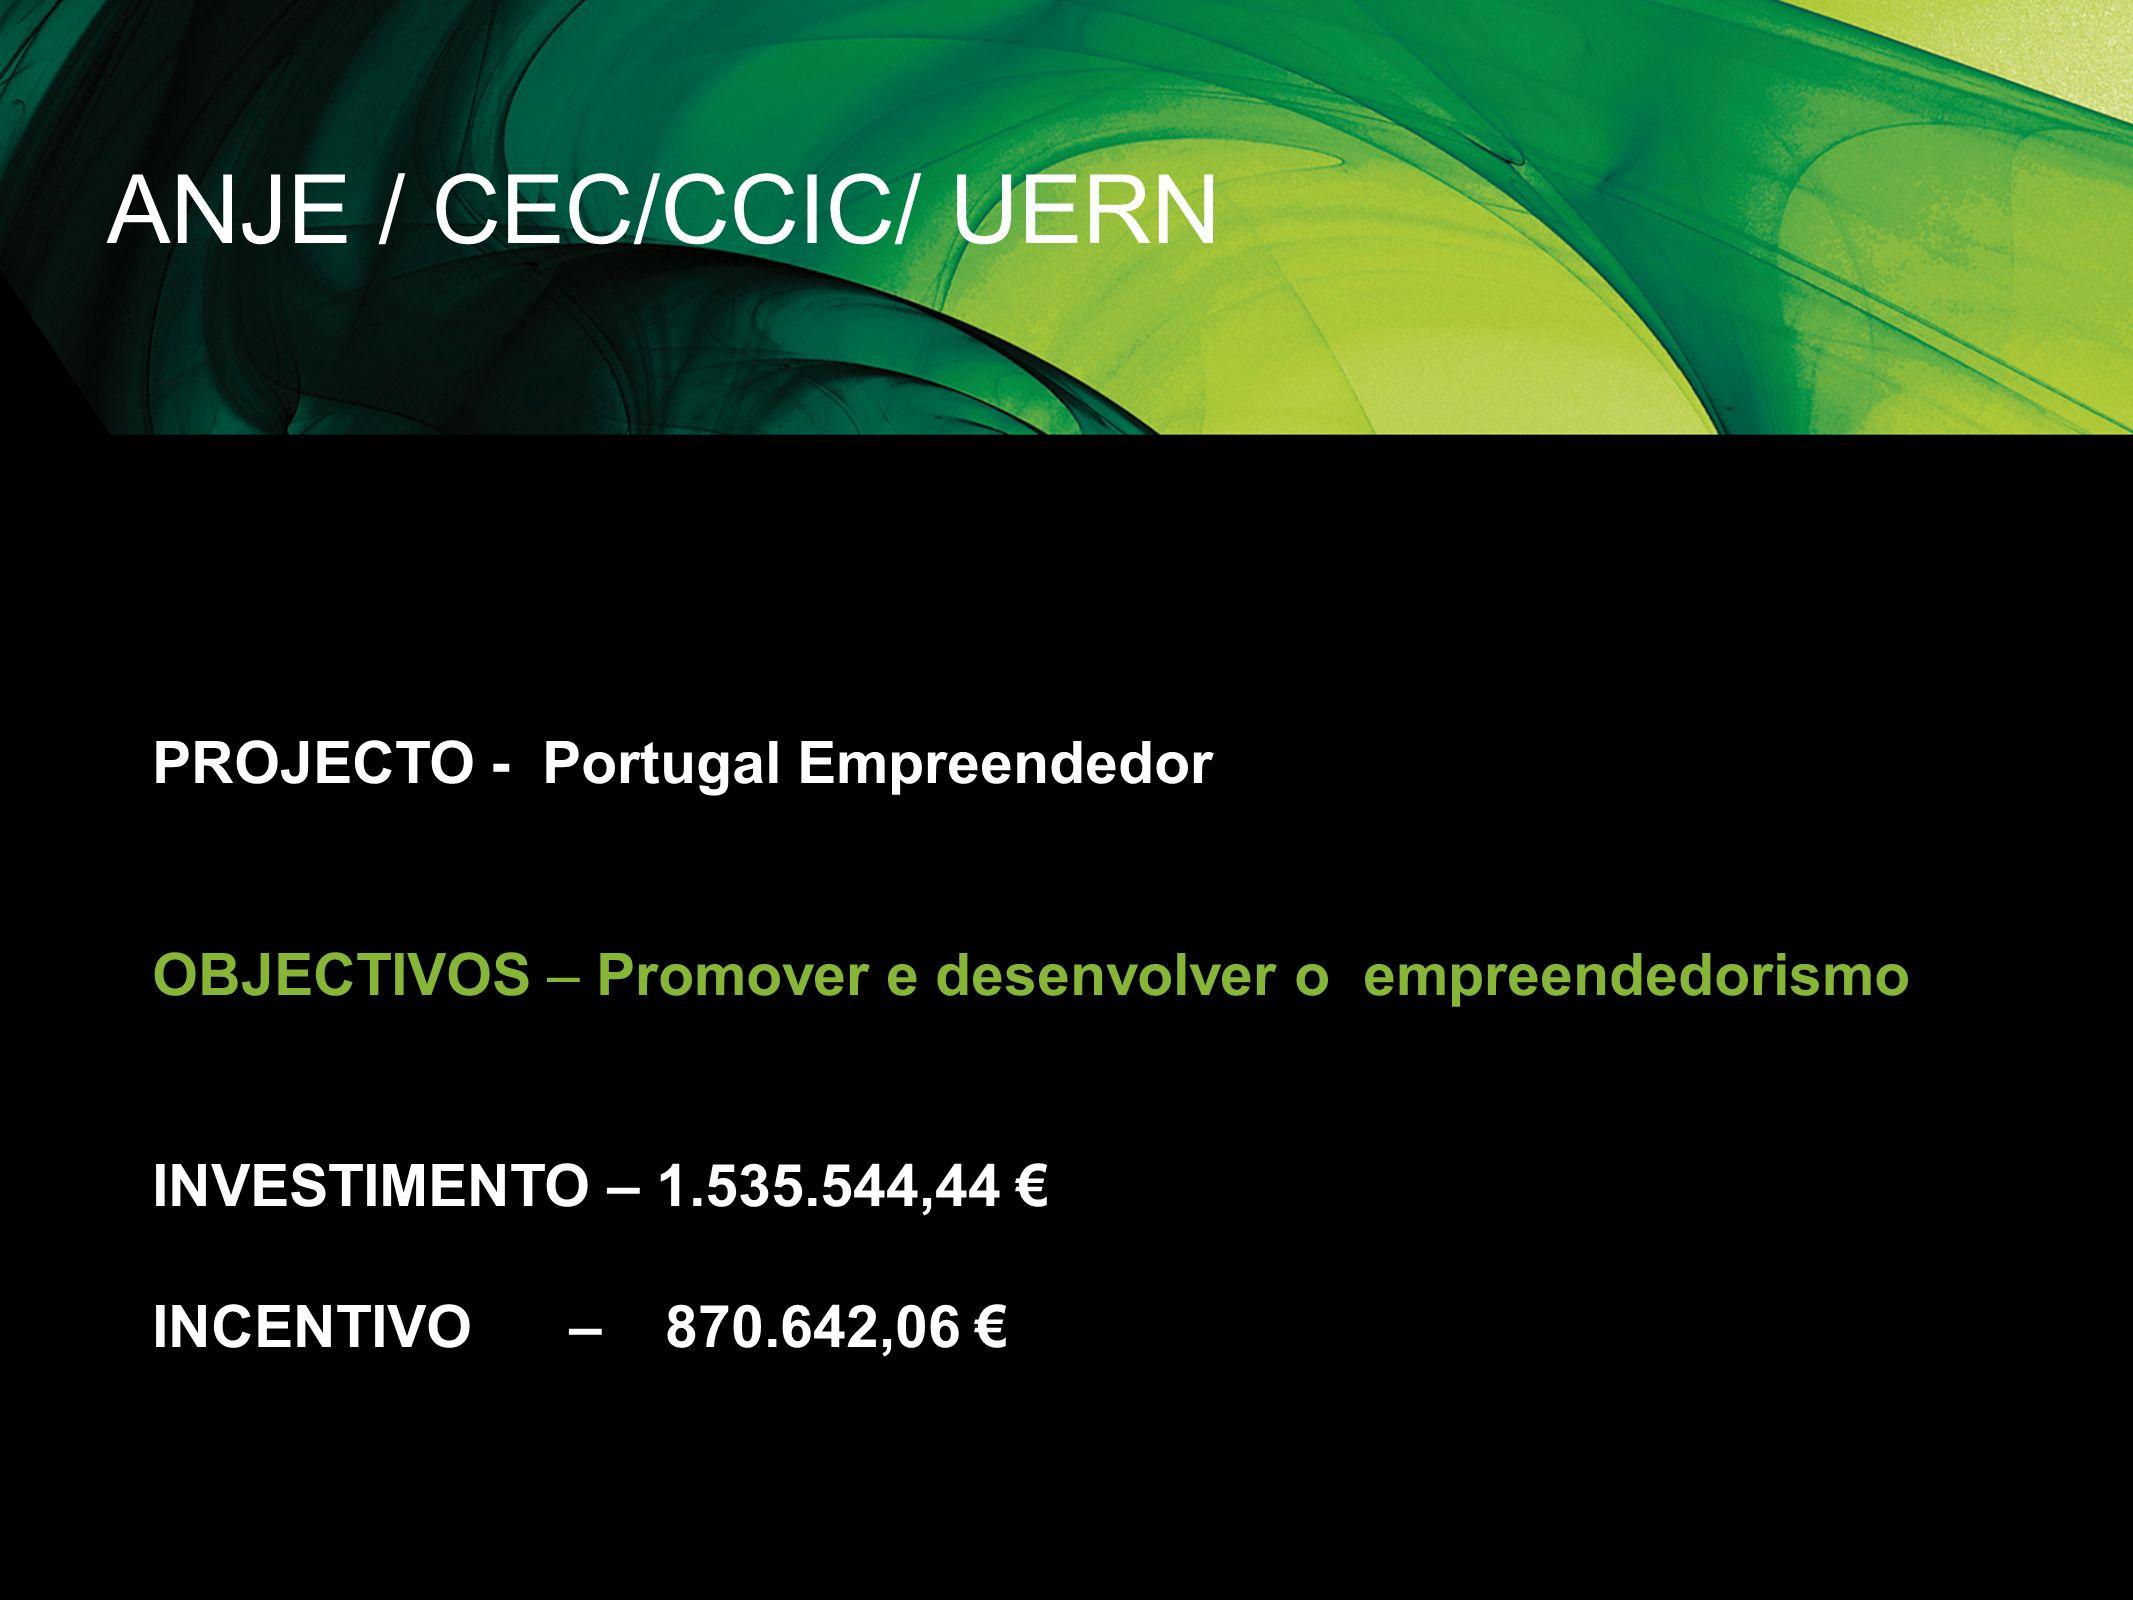 ANJE / CEC/CCIC/ UERN PROJECTO - Portugal Empreendedor OBJECTIVOS – Promover e desenvolver o empreendedorismo INVESTIMENTO – 1.535.544,44 INCENTIVO –